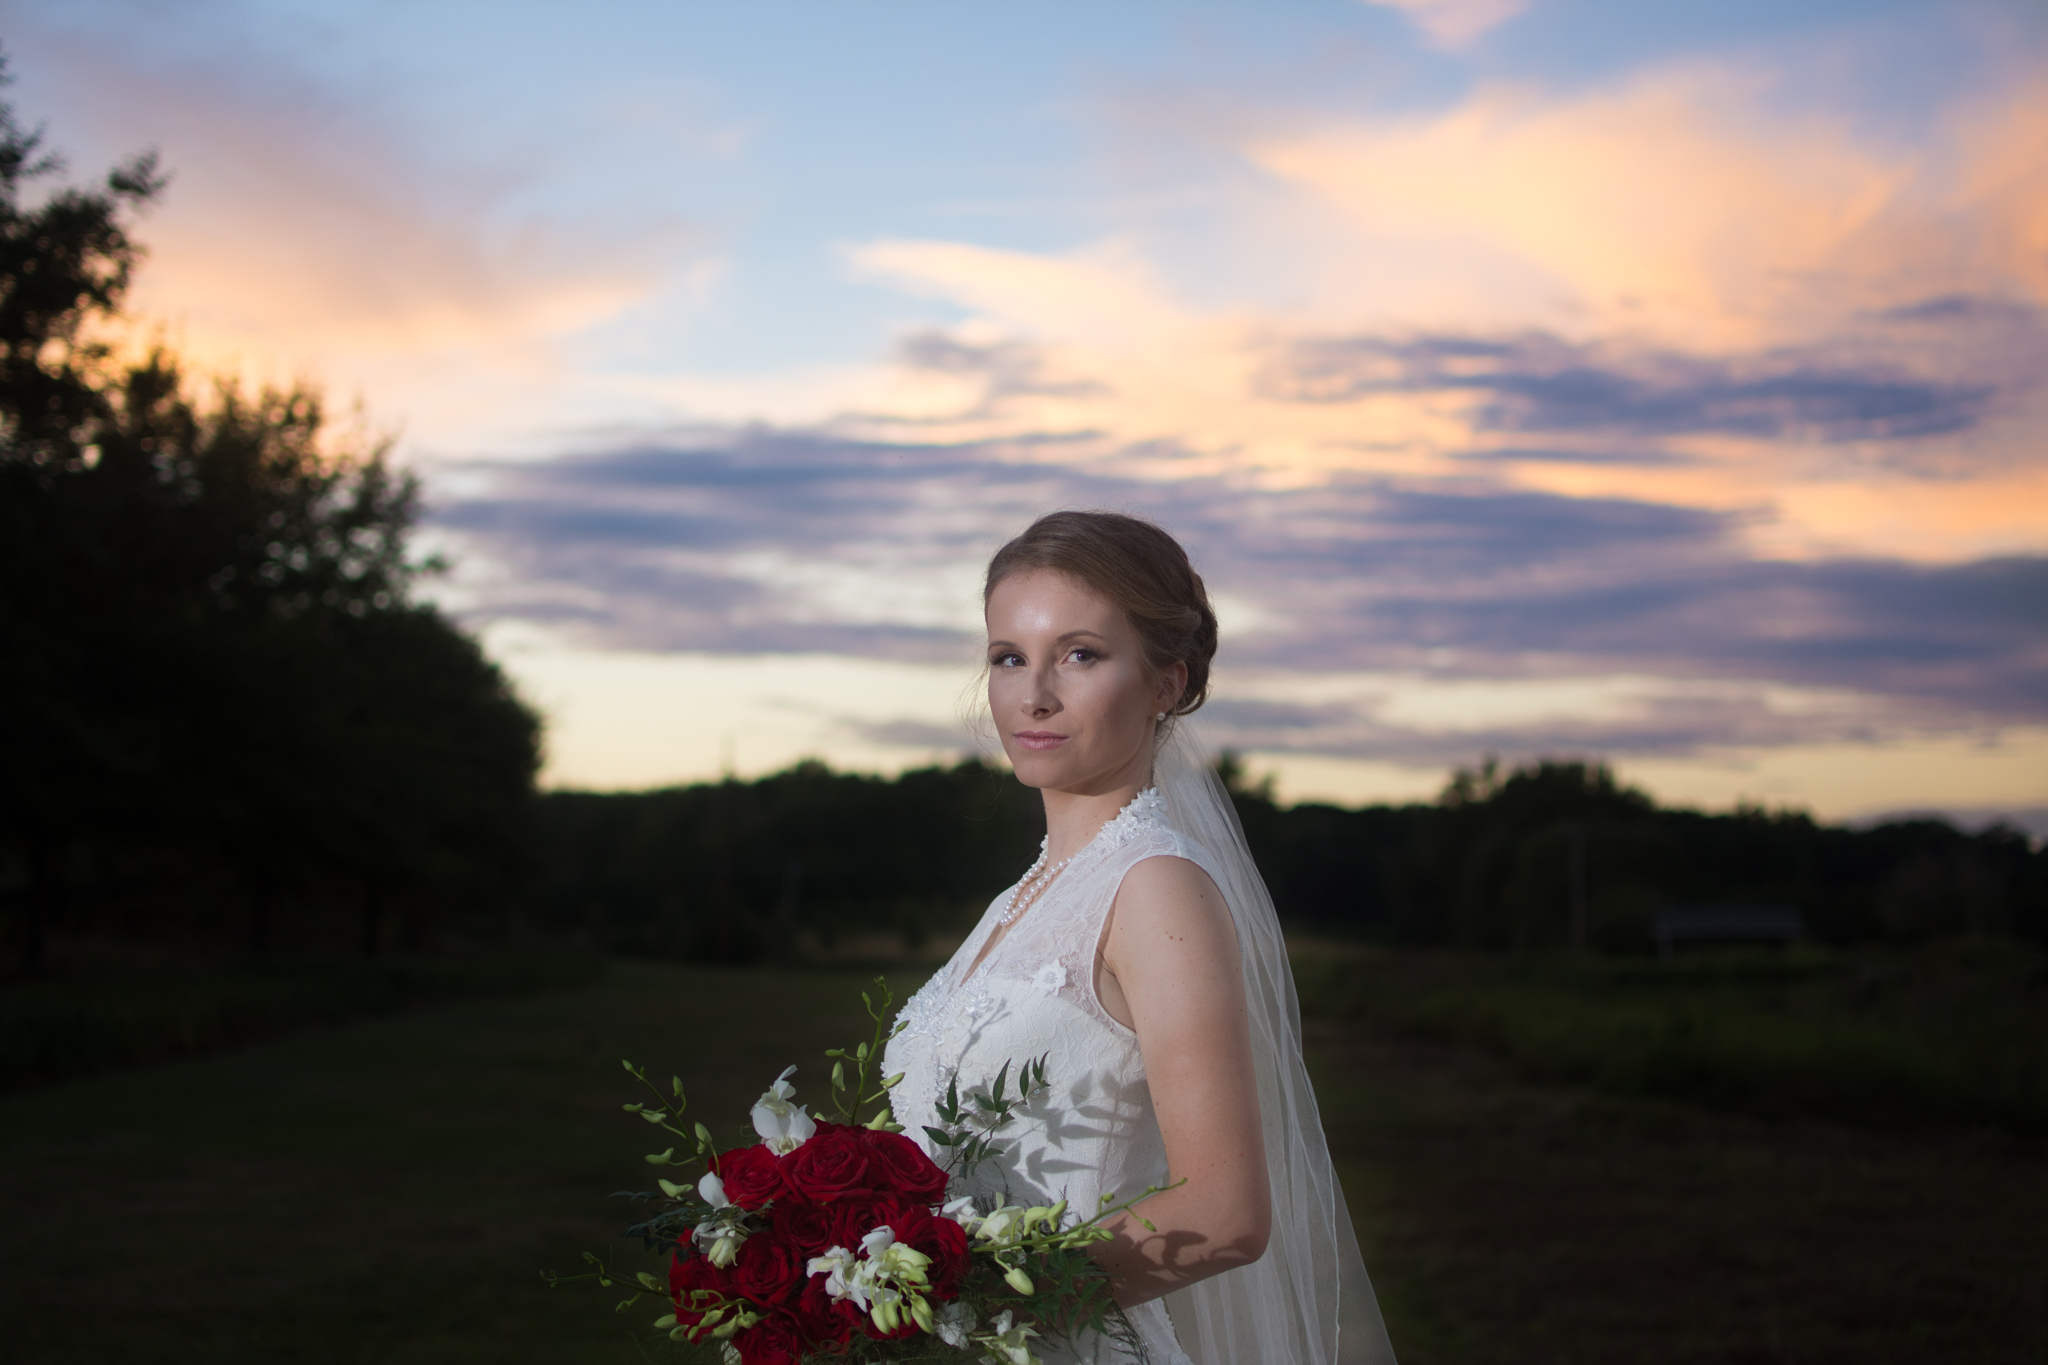 bridalportraits (46 of 49).JPG